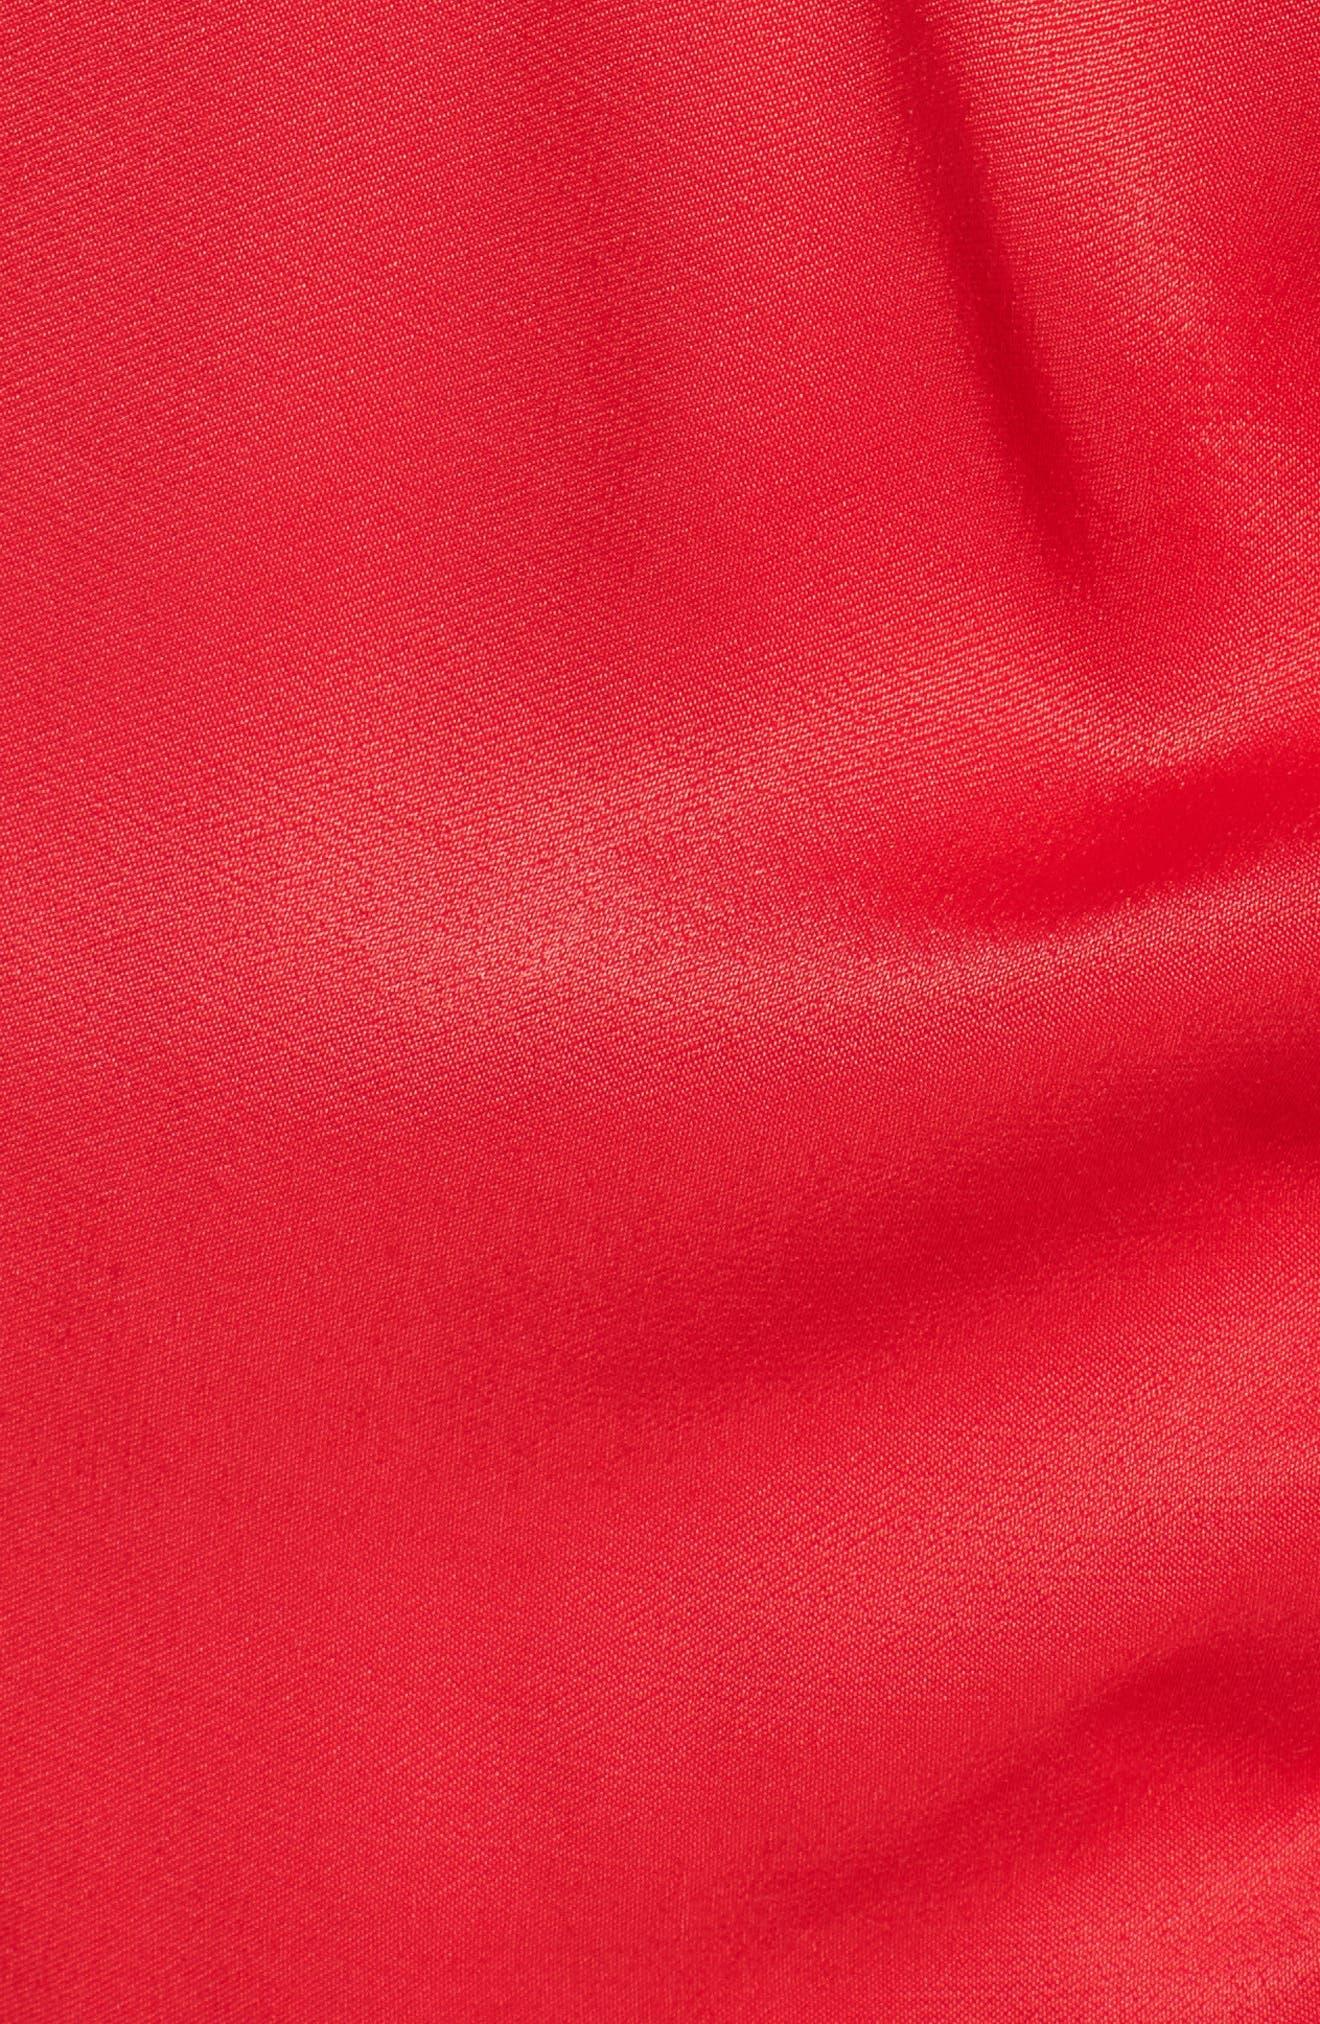 Satin Wrap Dress,                             Alternate thumbnail 5, color,